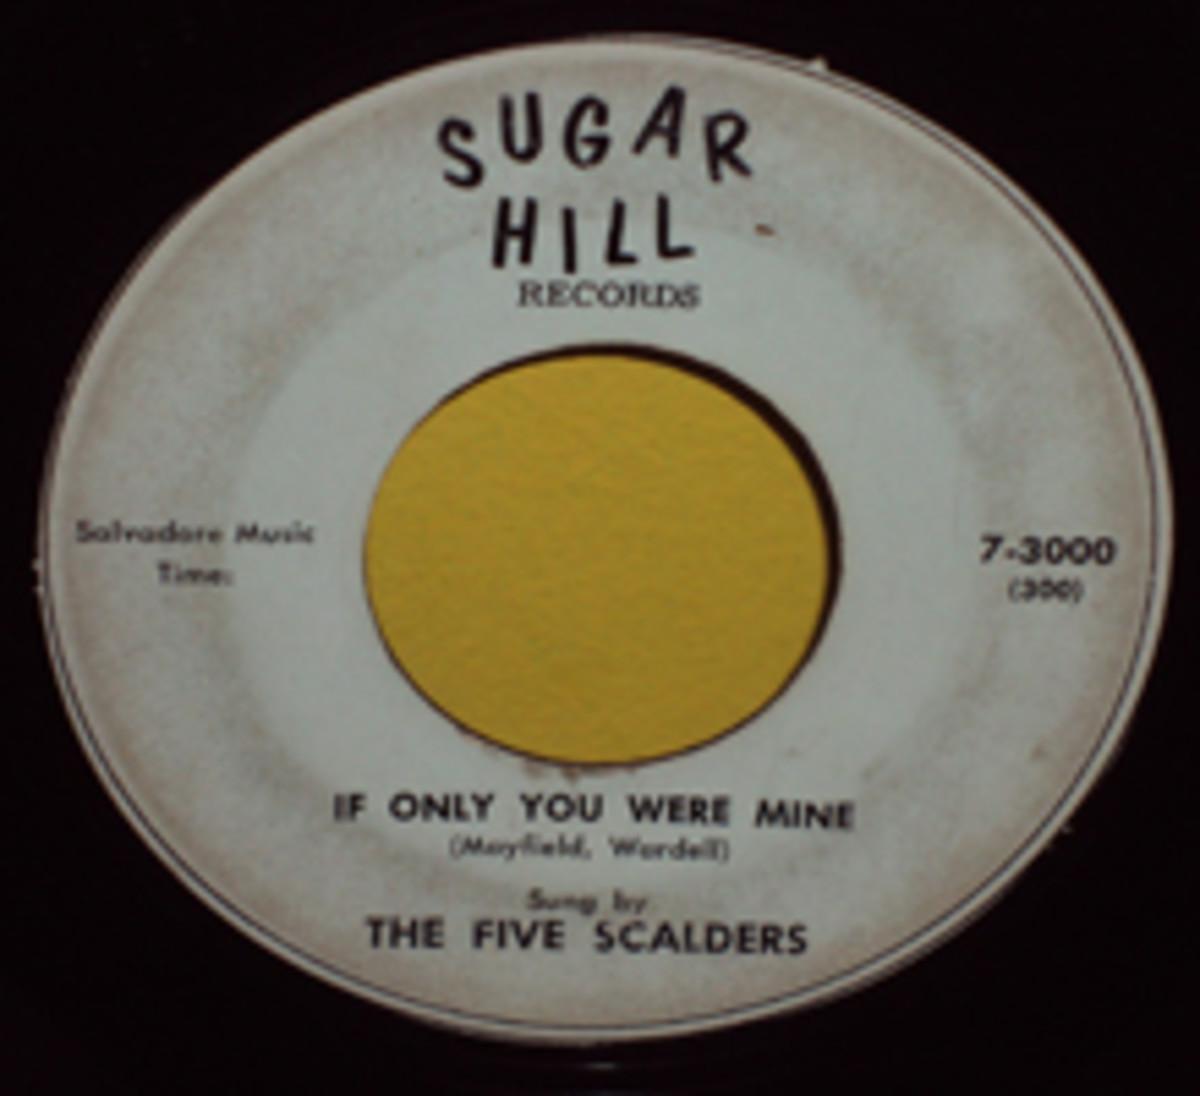 Five Scalders Sugar Hill 73000